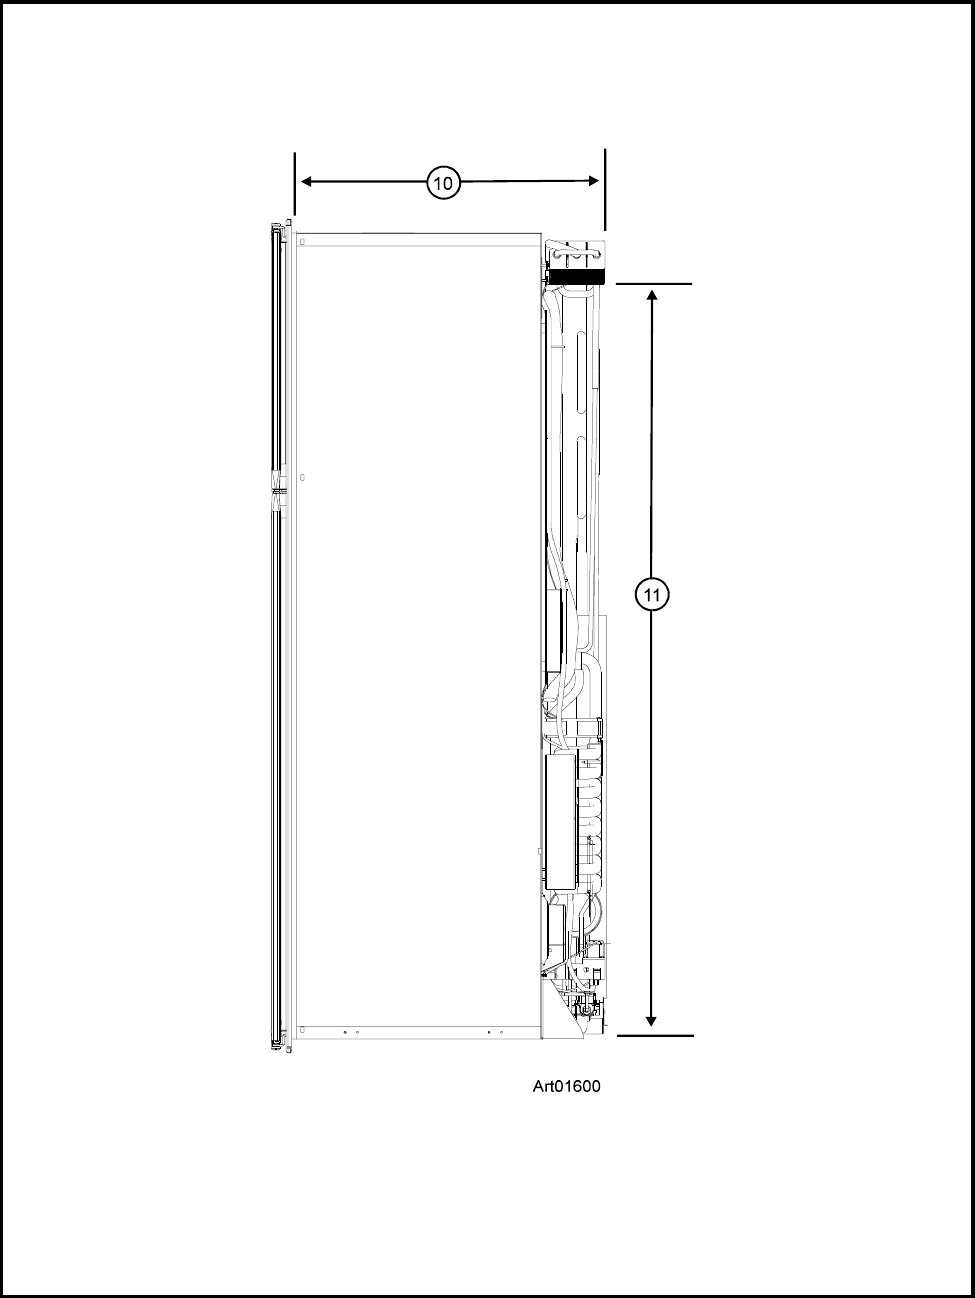 Norcold Refrigerator 120x Users Manual 621824 Patchp65 Ac Dc Schematics Ecivresdlocrondezirohtuarorelaedruoyeeselbacivresrenwotonsisiht Retnec 10510tra